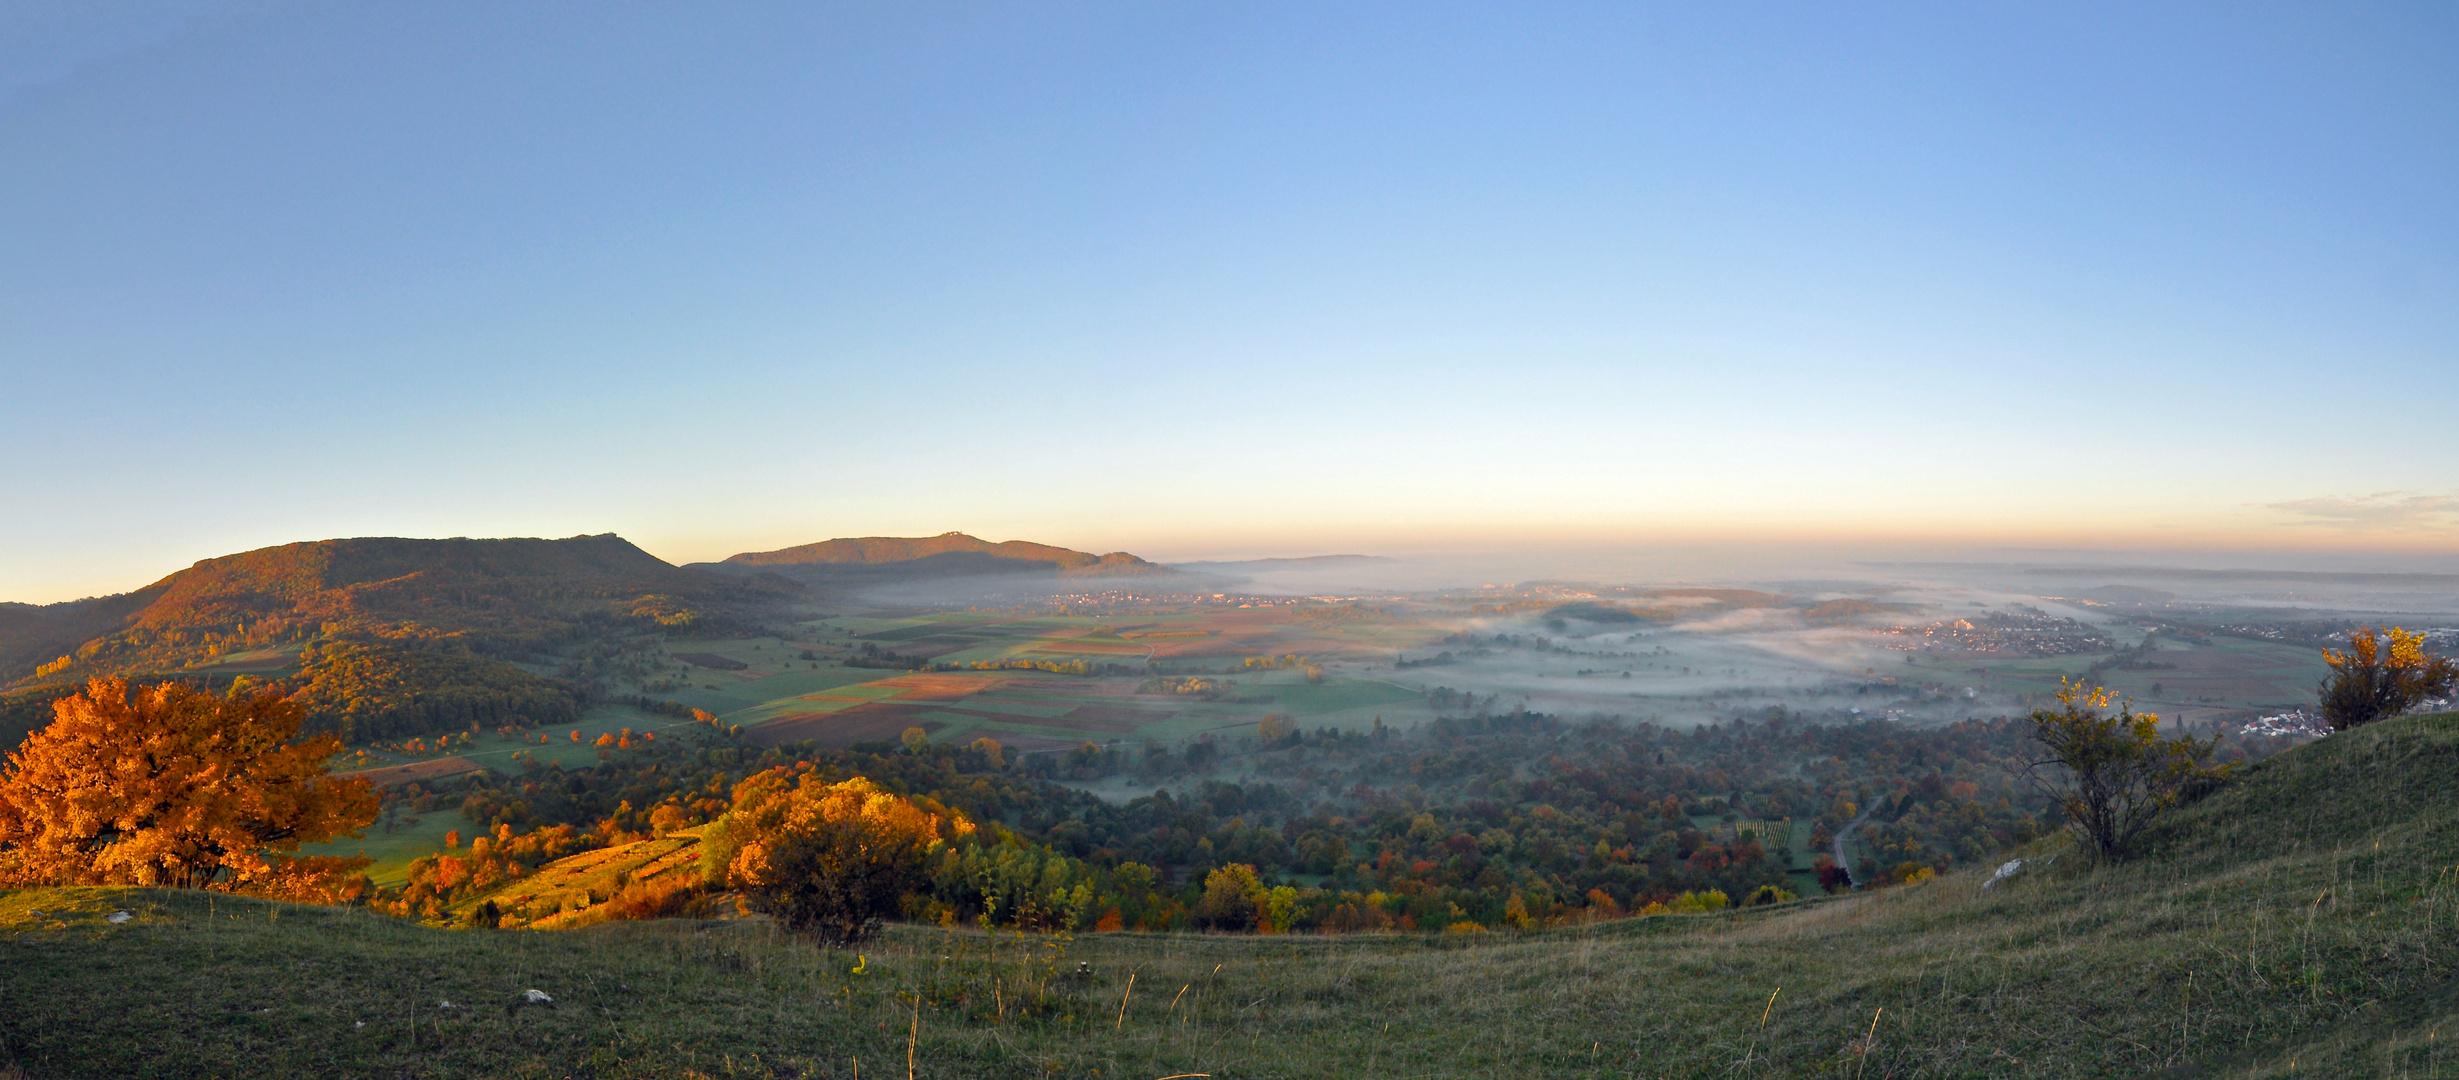 KIrchheim Teck unter dem Nebel